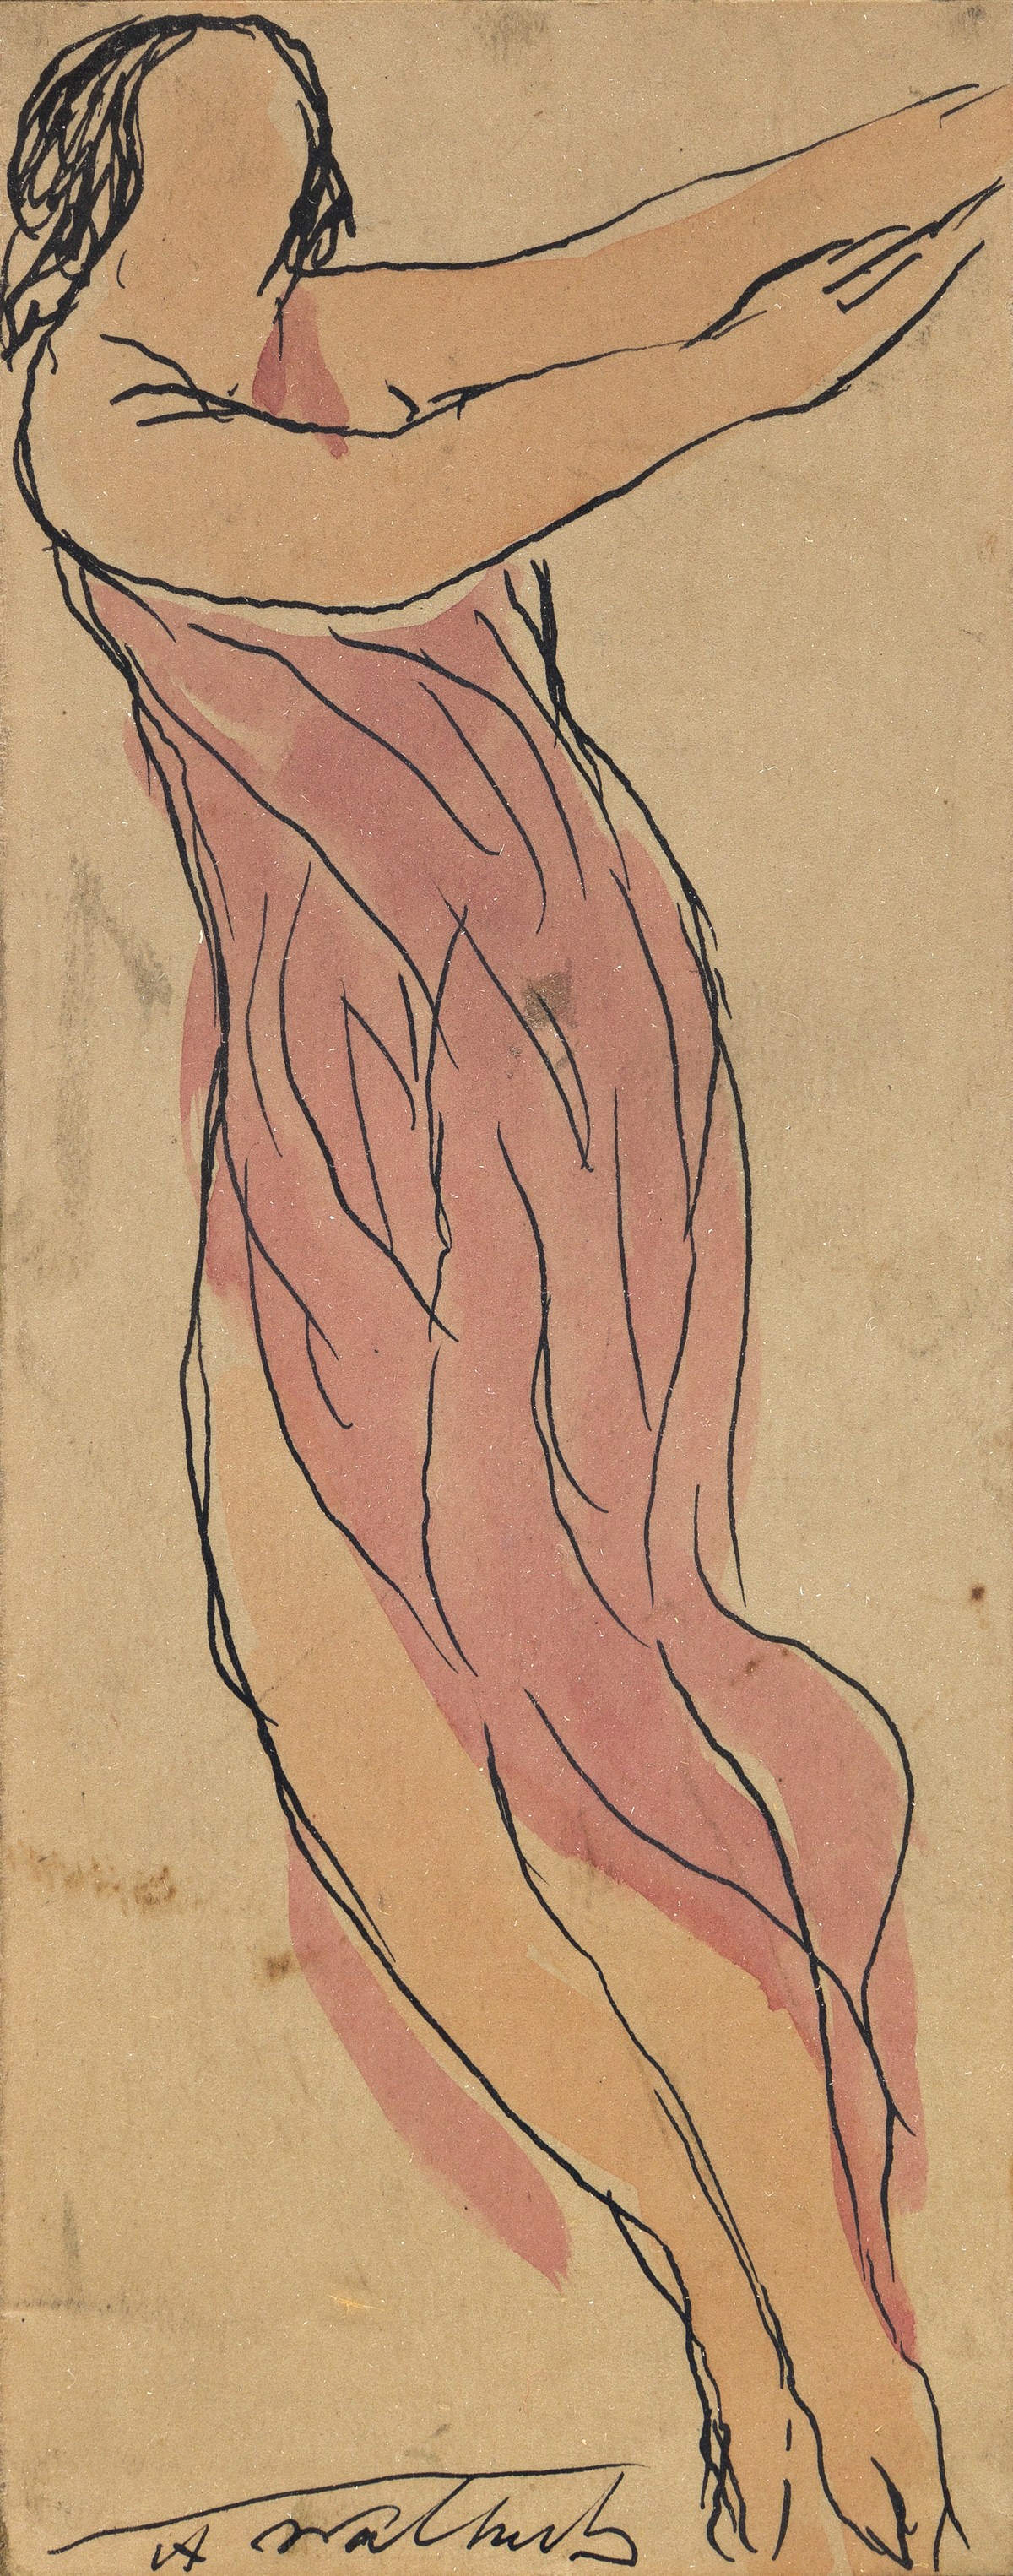 ABRAHAM WALKOWITZ (1878-1965) Isadora Duncan.